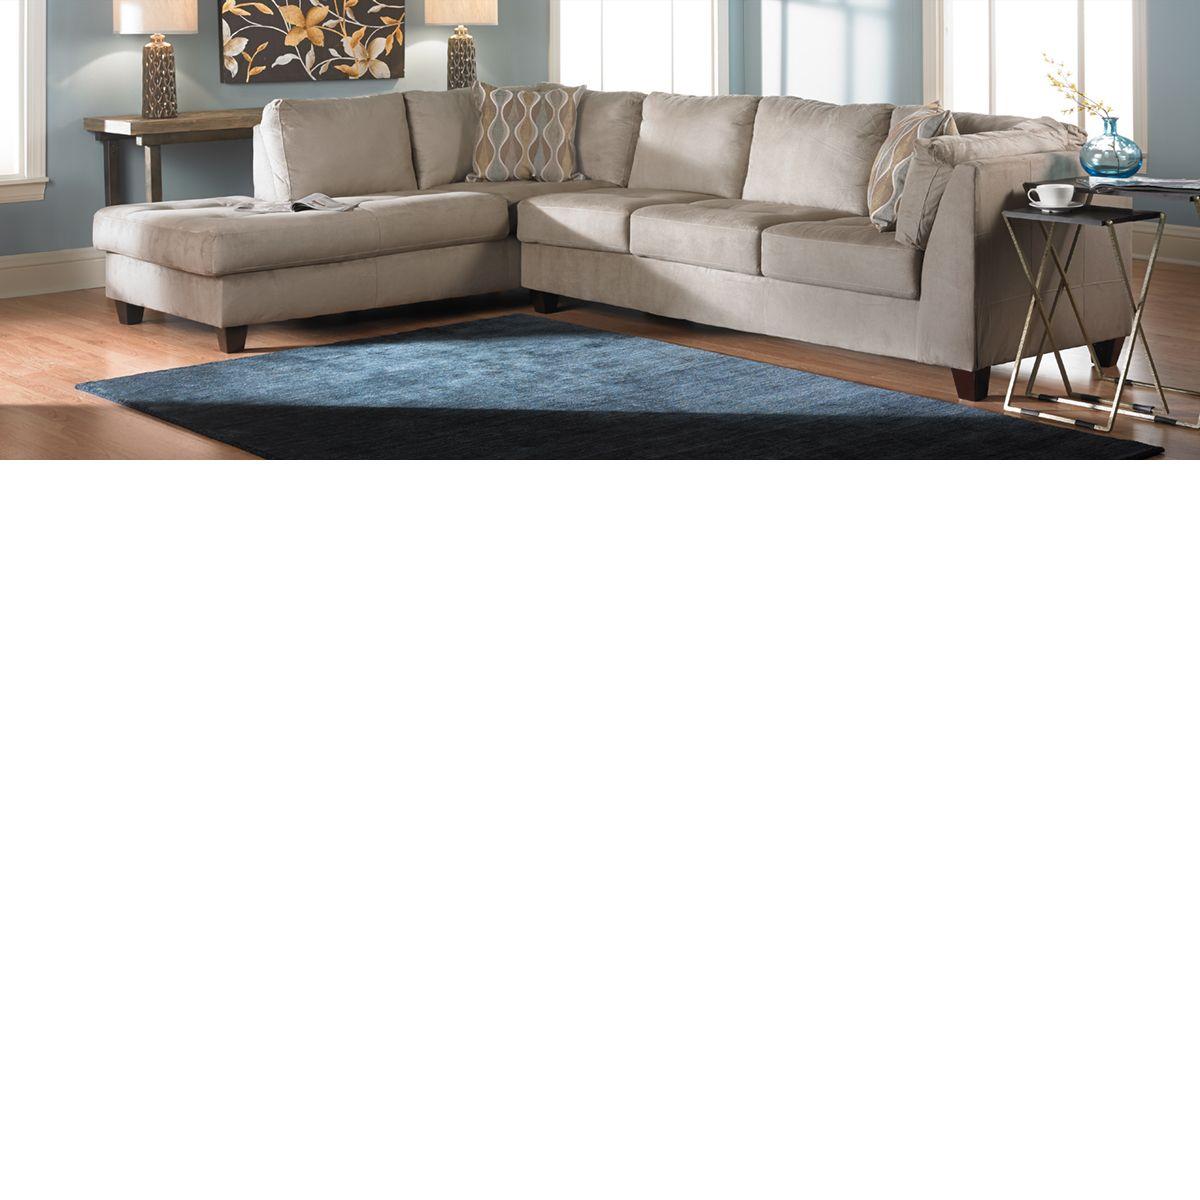 The Dump Furniture Outlet Sectional Sofa Dump Furniture Grey